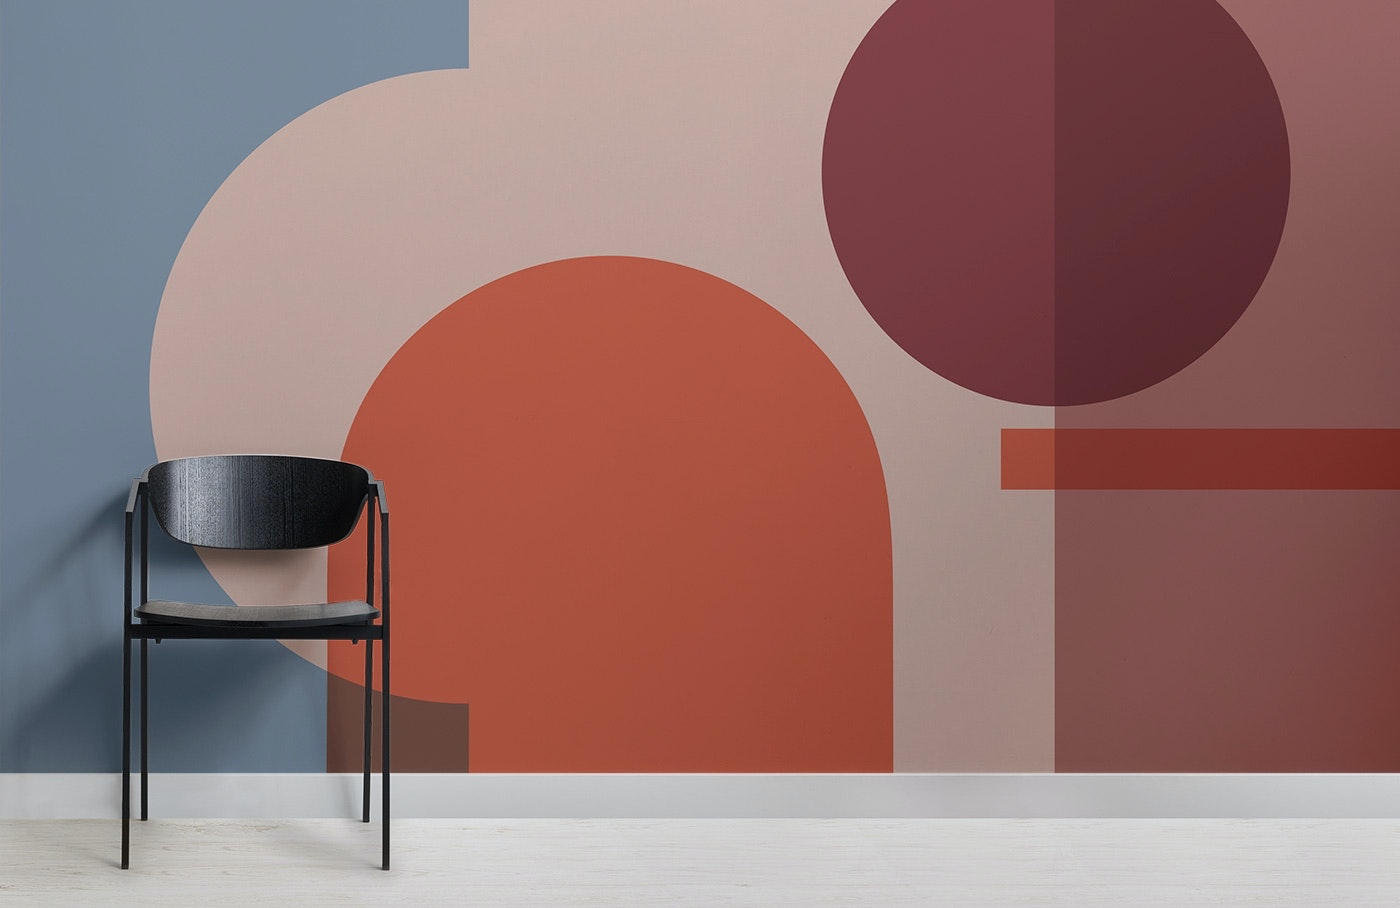 Se Tapetet Der Hylder 100aret For Bauhaus Skolen Bobedre Dk